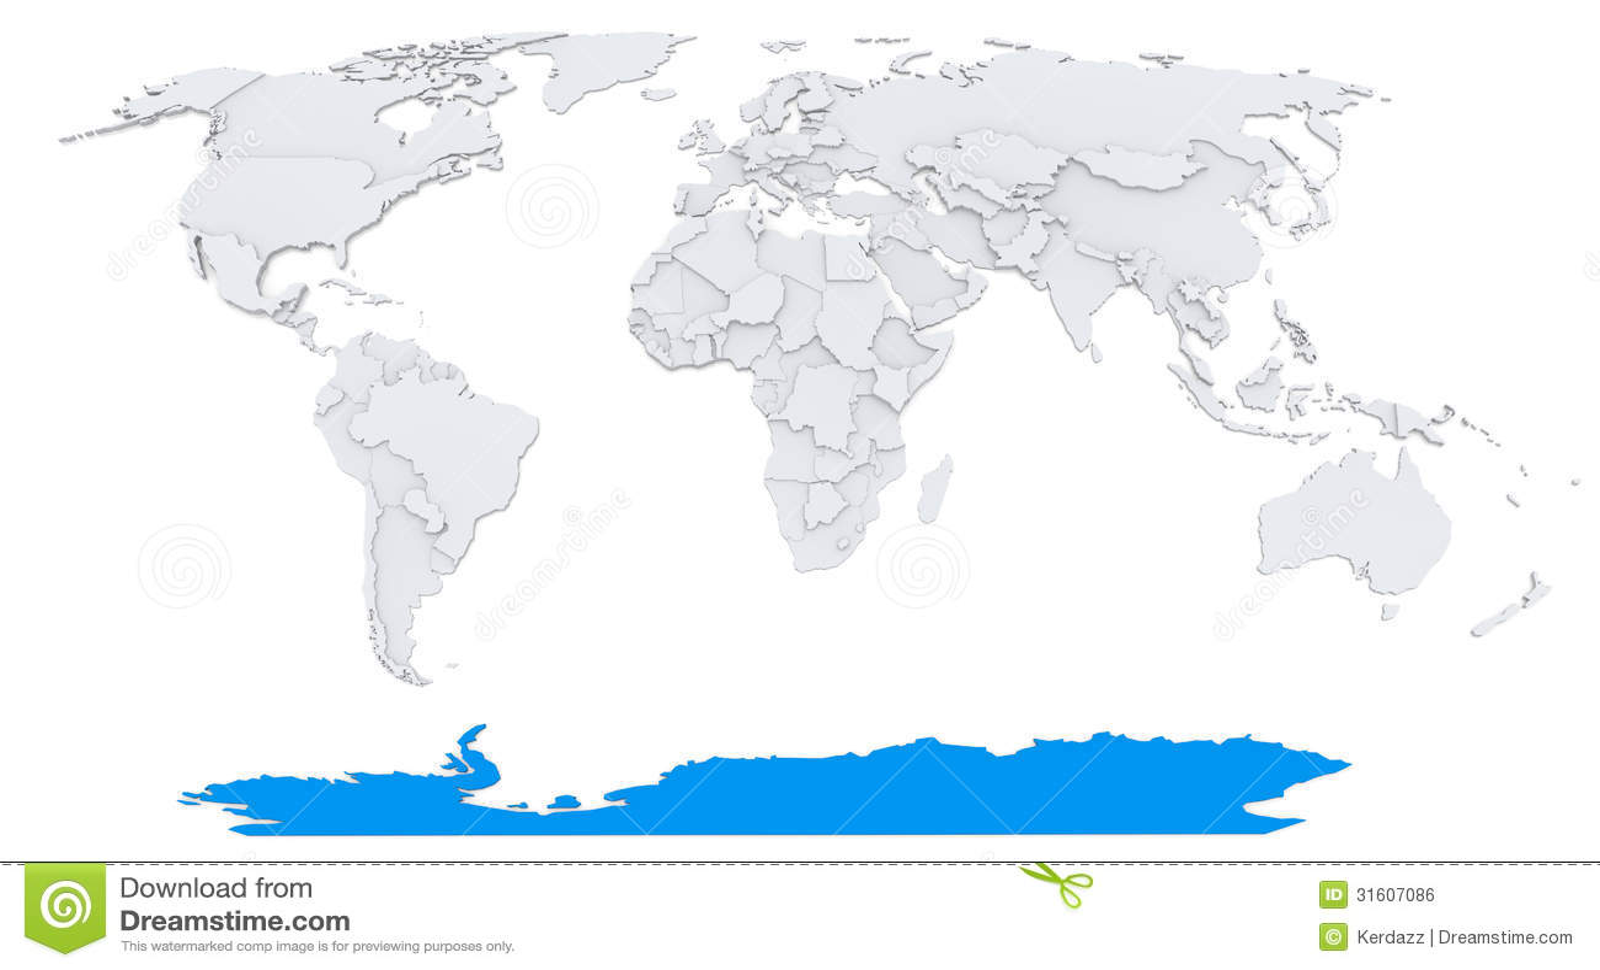 World Map With Antarctica